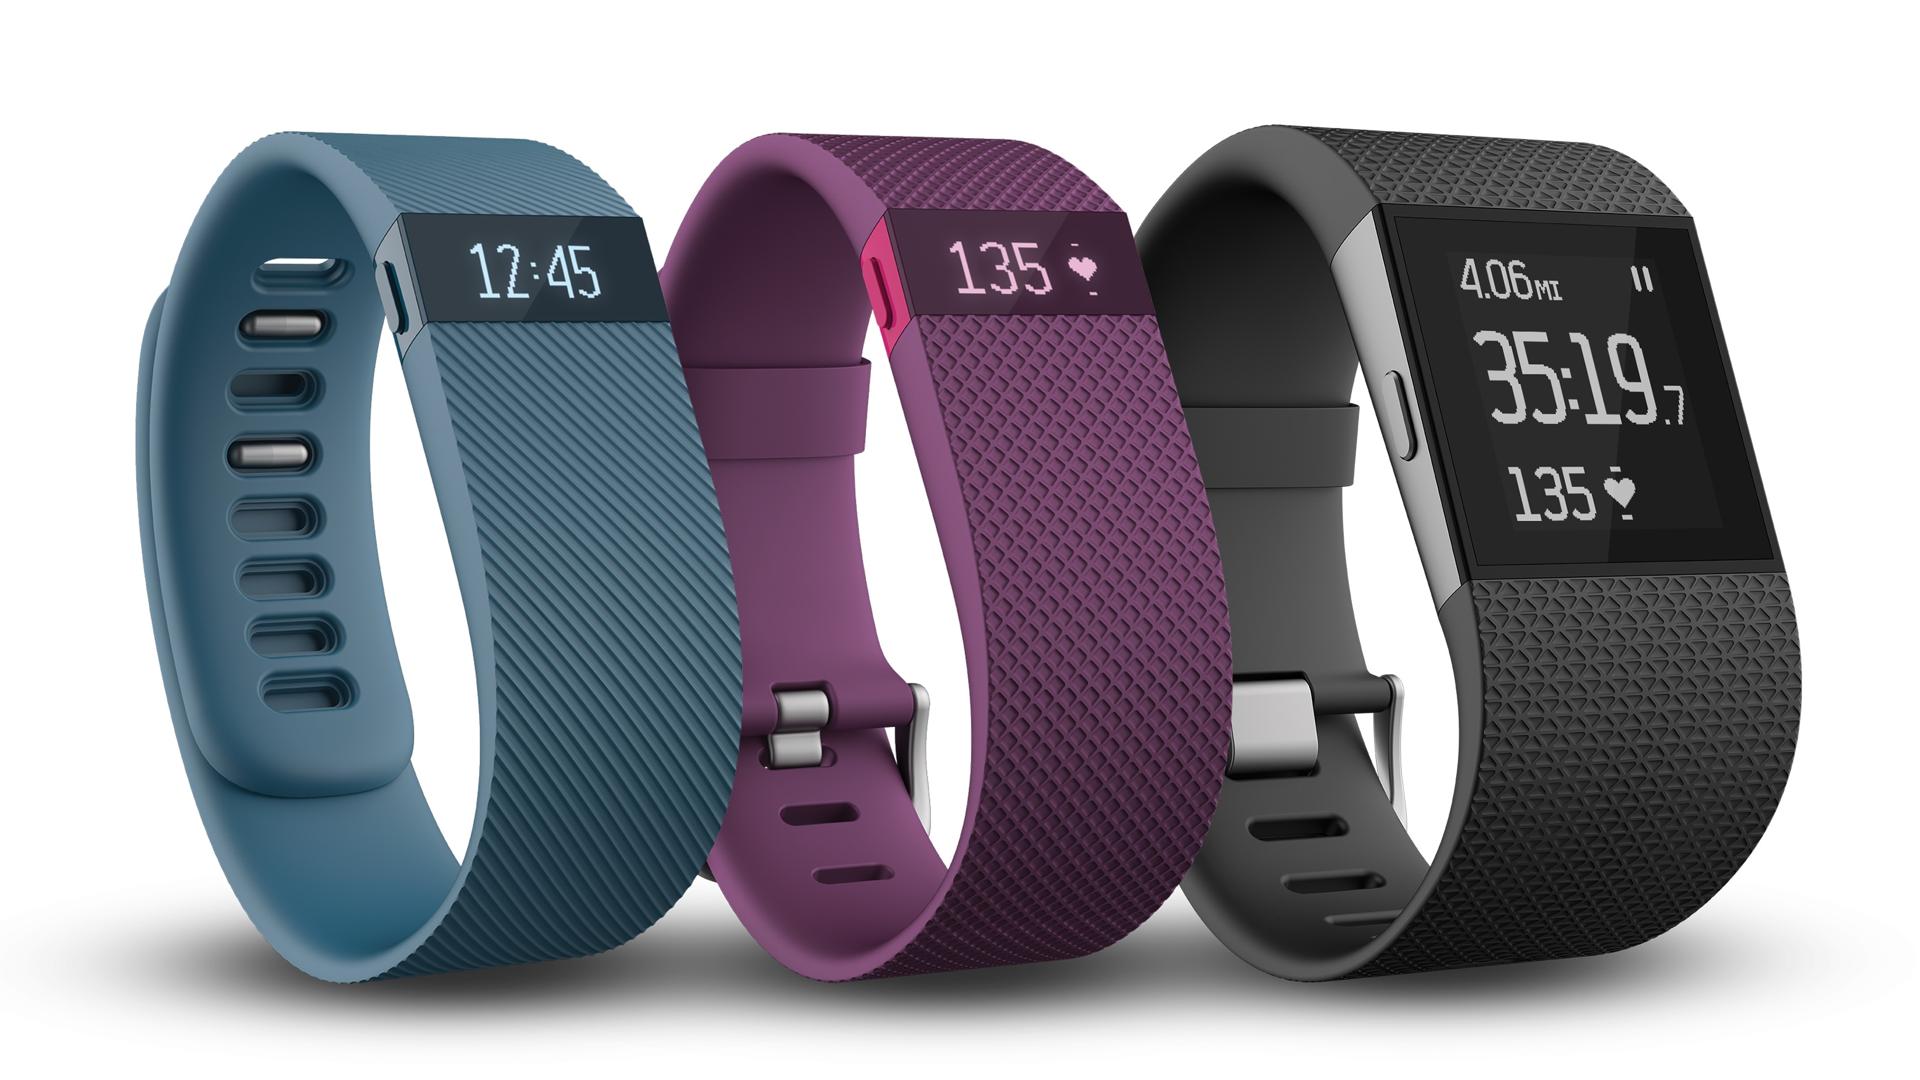 V.l.n.r: Fitbit Chrage, Fitbit Charge HR, Fitbit Surge.